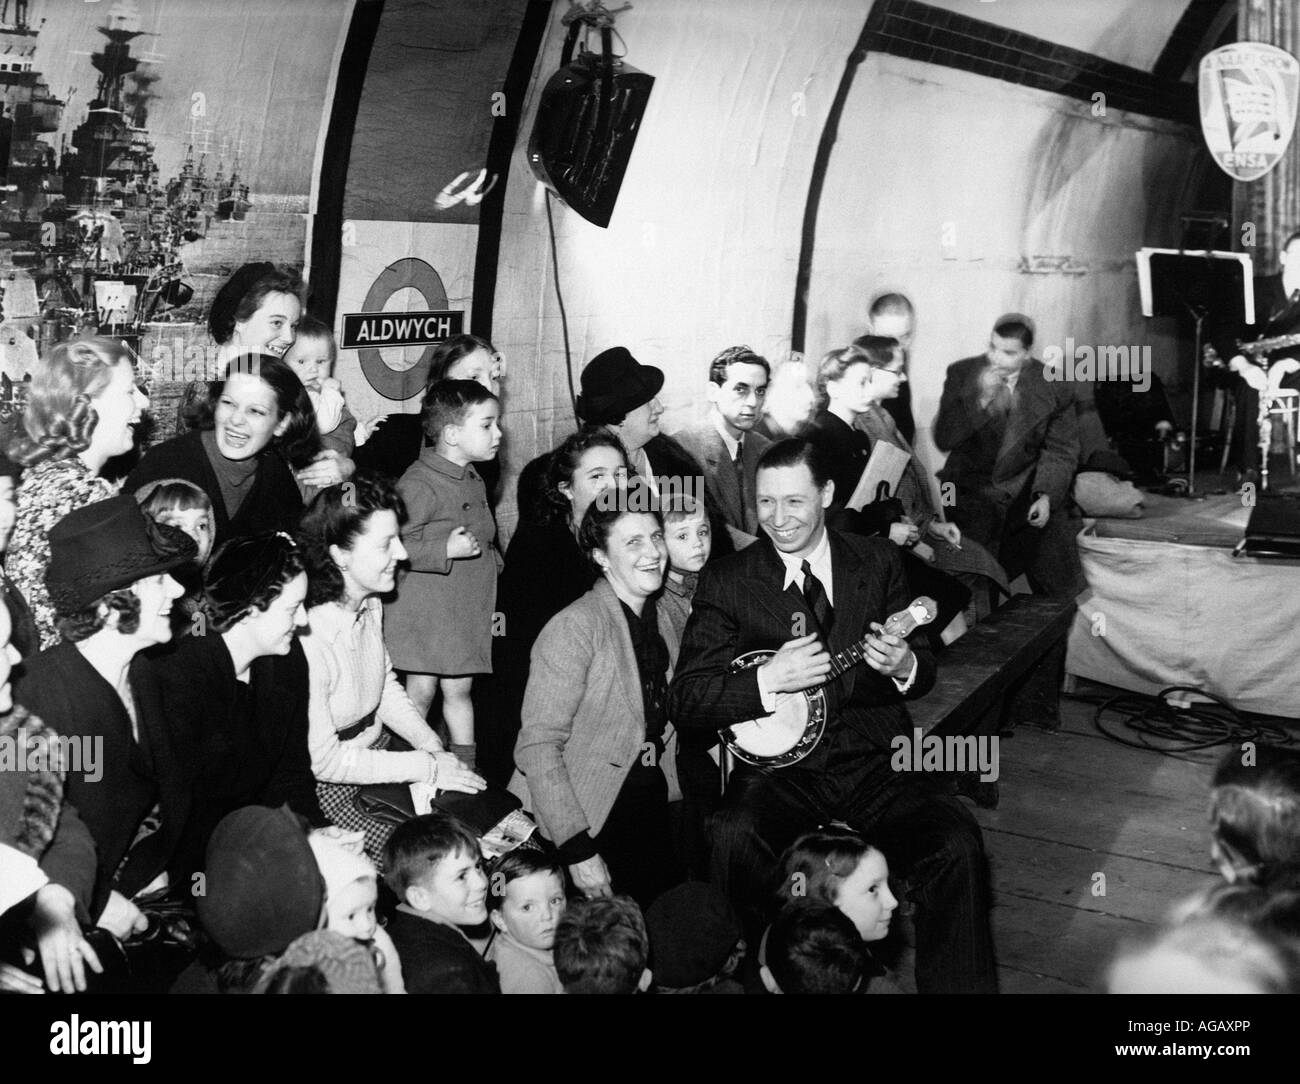 GEORGE FORMBY UK music-hall artista intrattiene i londinesi riparo dal bombardamento tedesco in Aldwych stazione Foto Stock